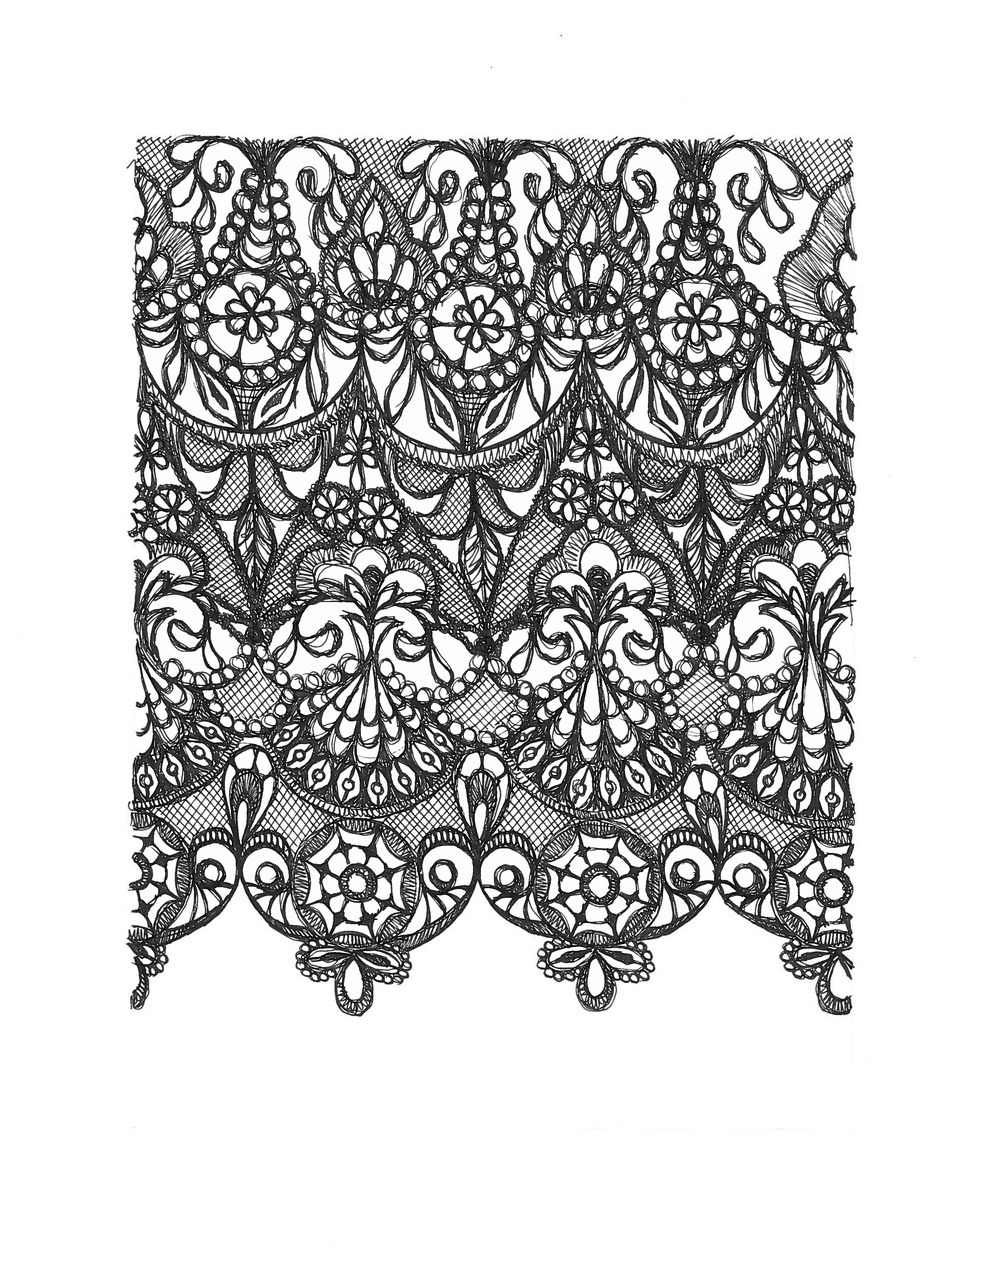 Baroque (11x14)